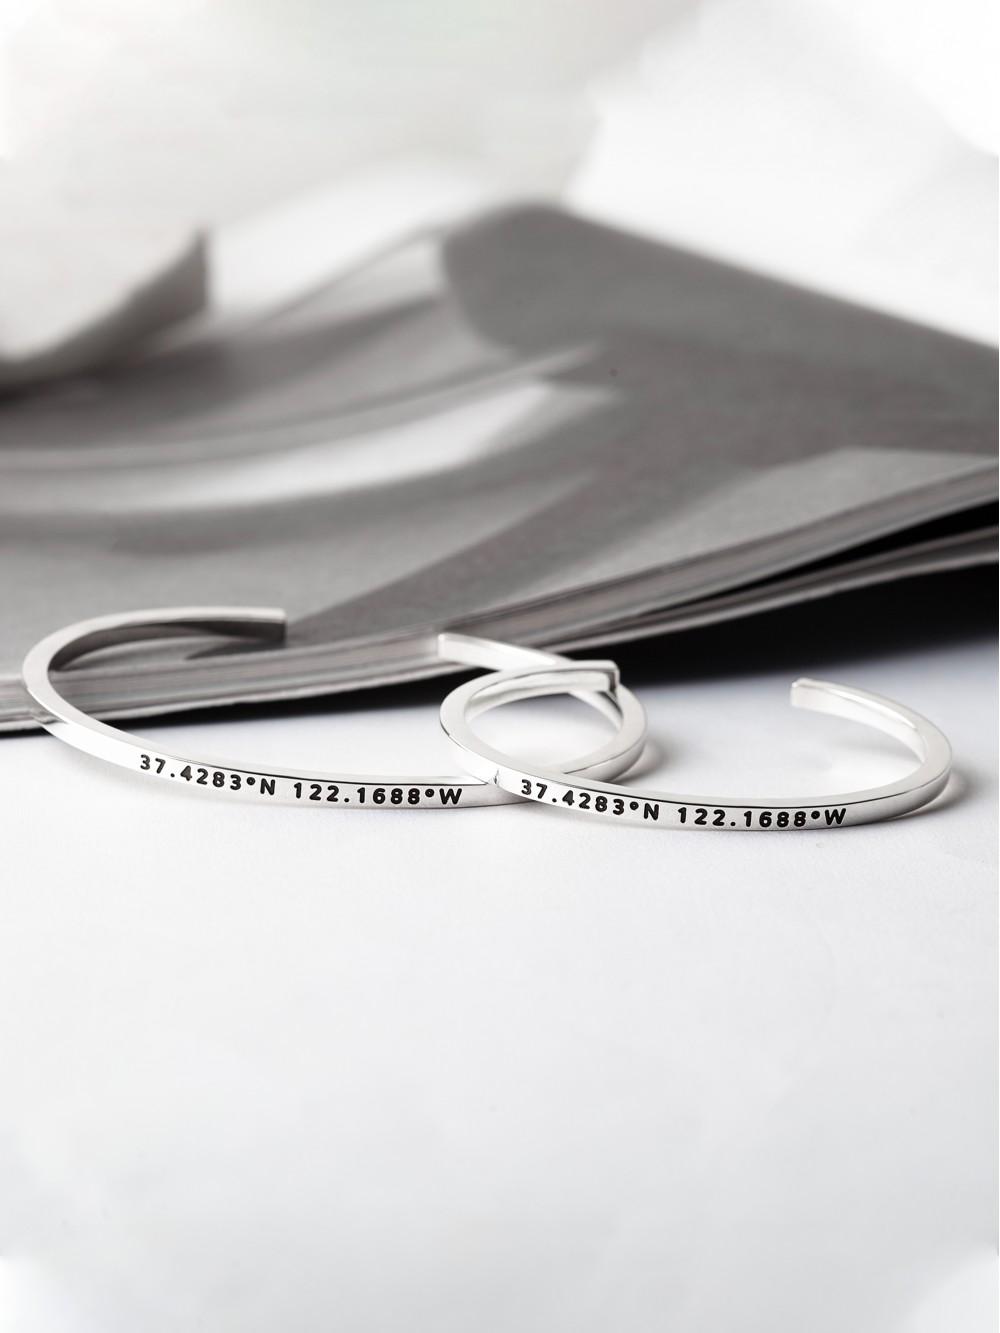 Husband and Wife Bracelets - Coordinates